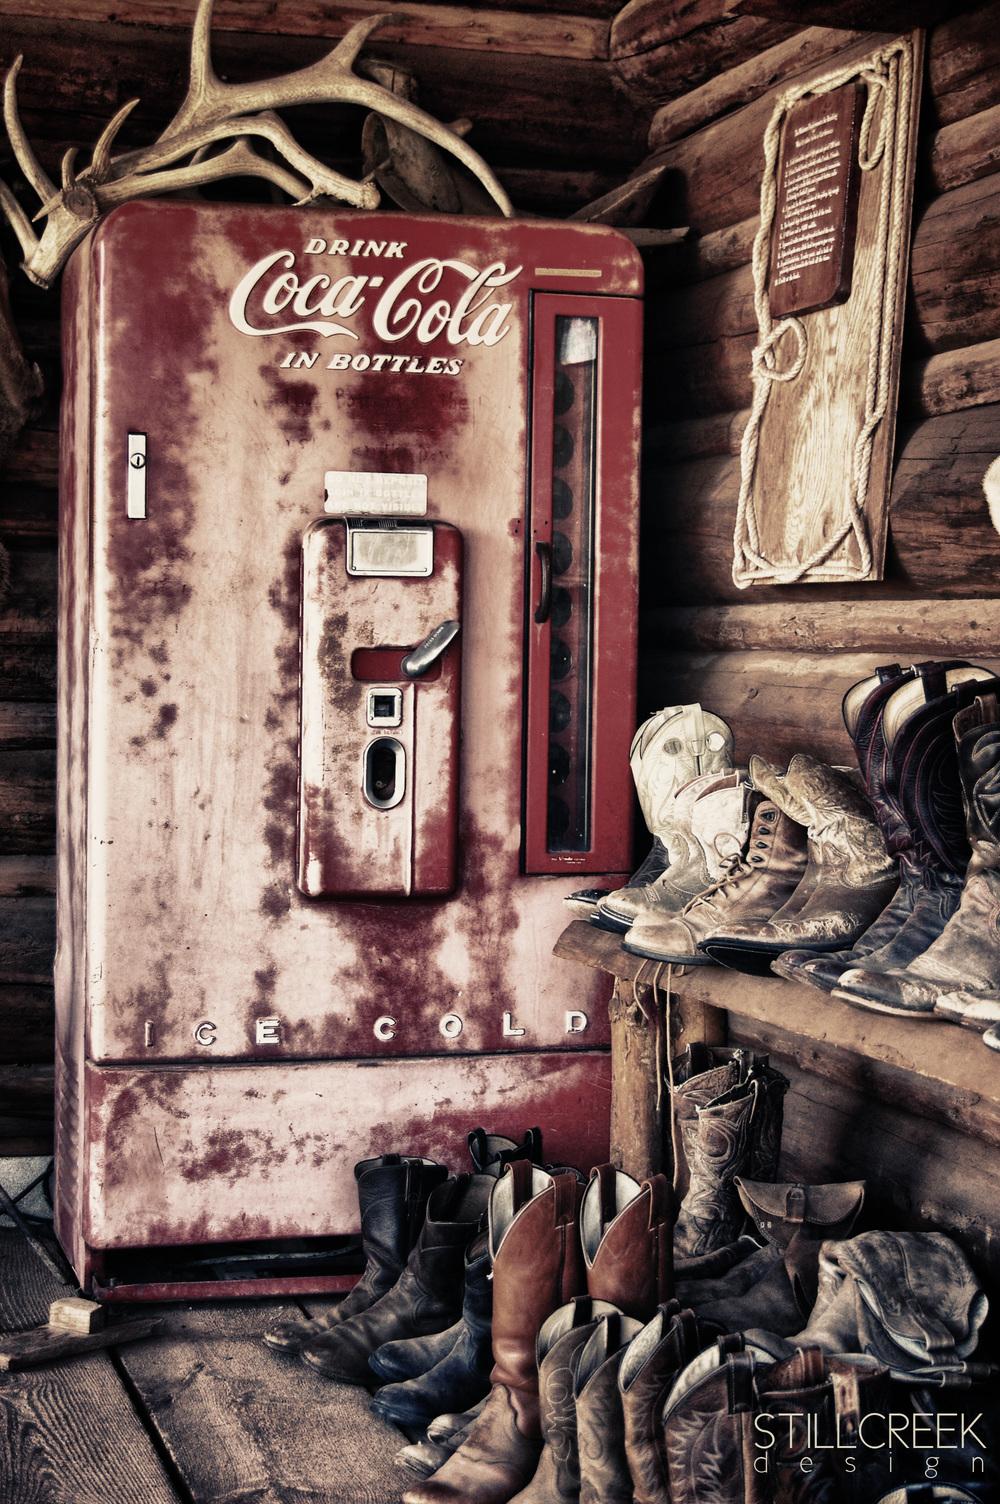 wyoming_coke.jpg